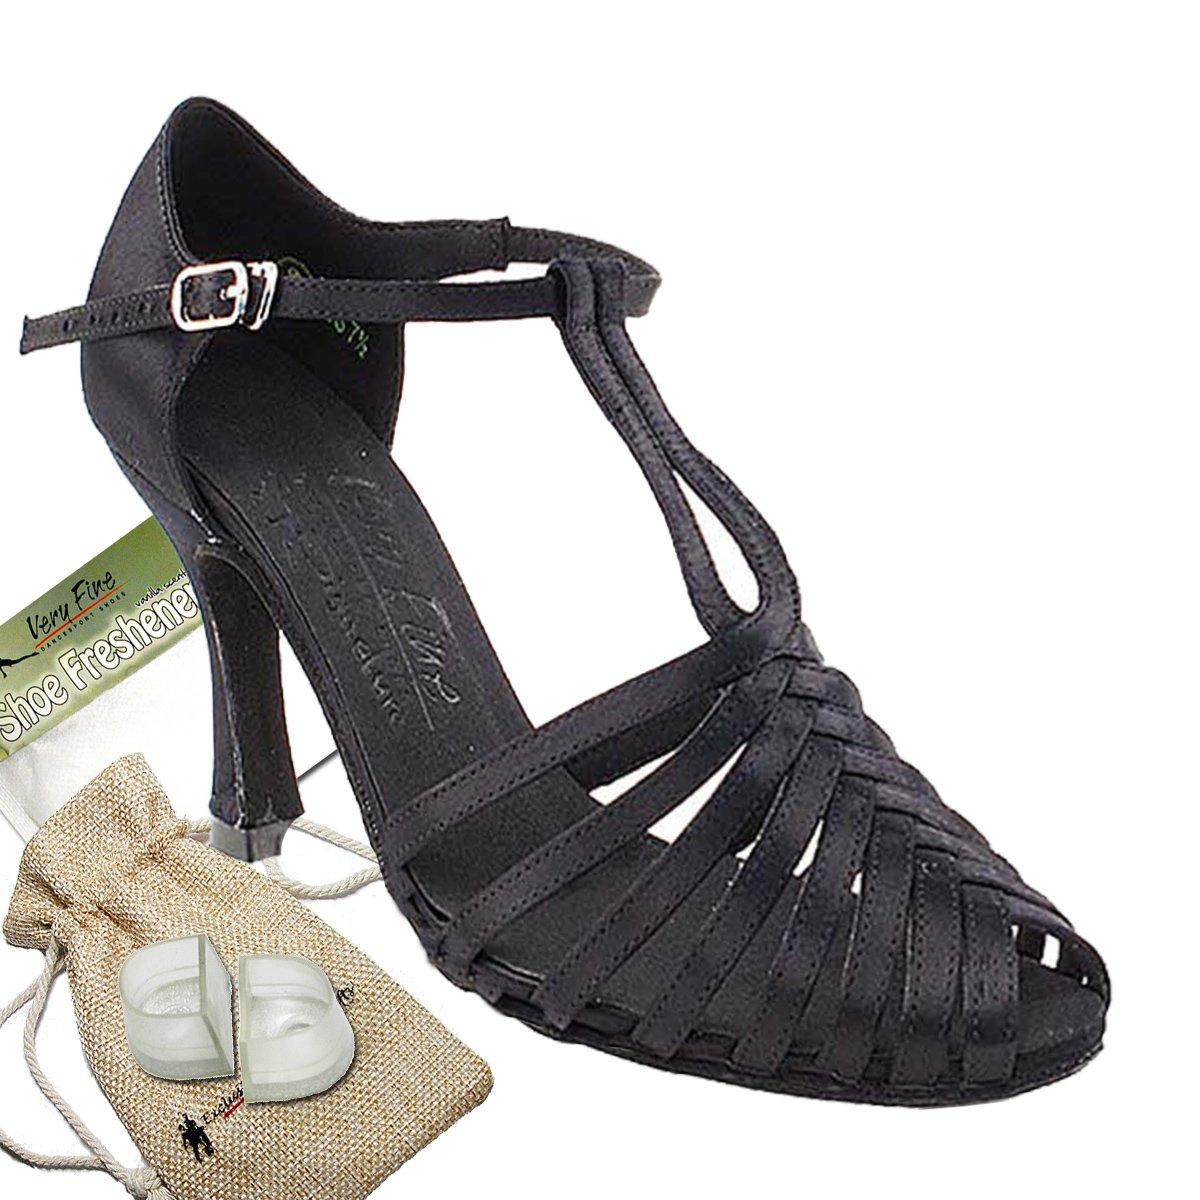 [Very Fine Dance Shoes] レディース B009XTRYRG ブラックサテン 8.5 B(M) US